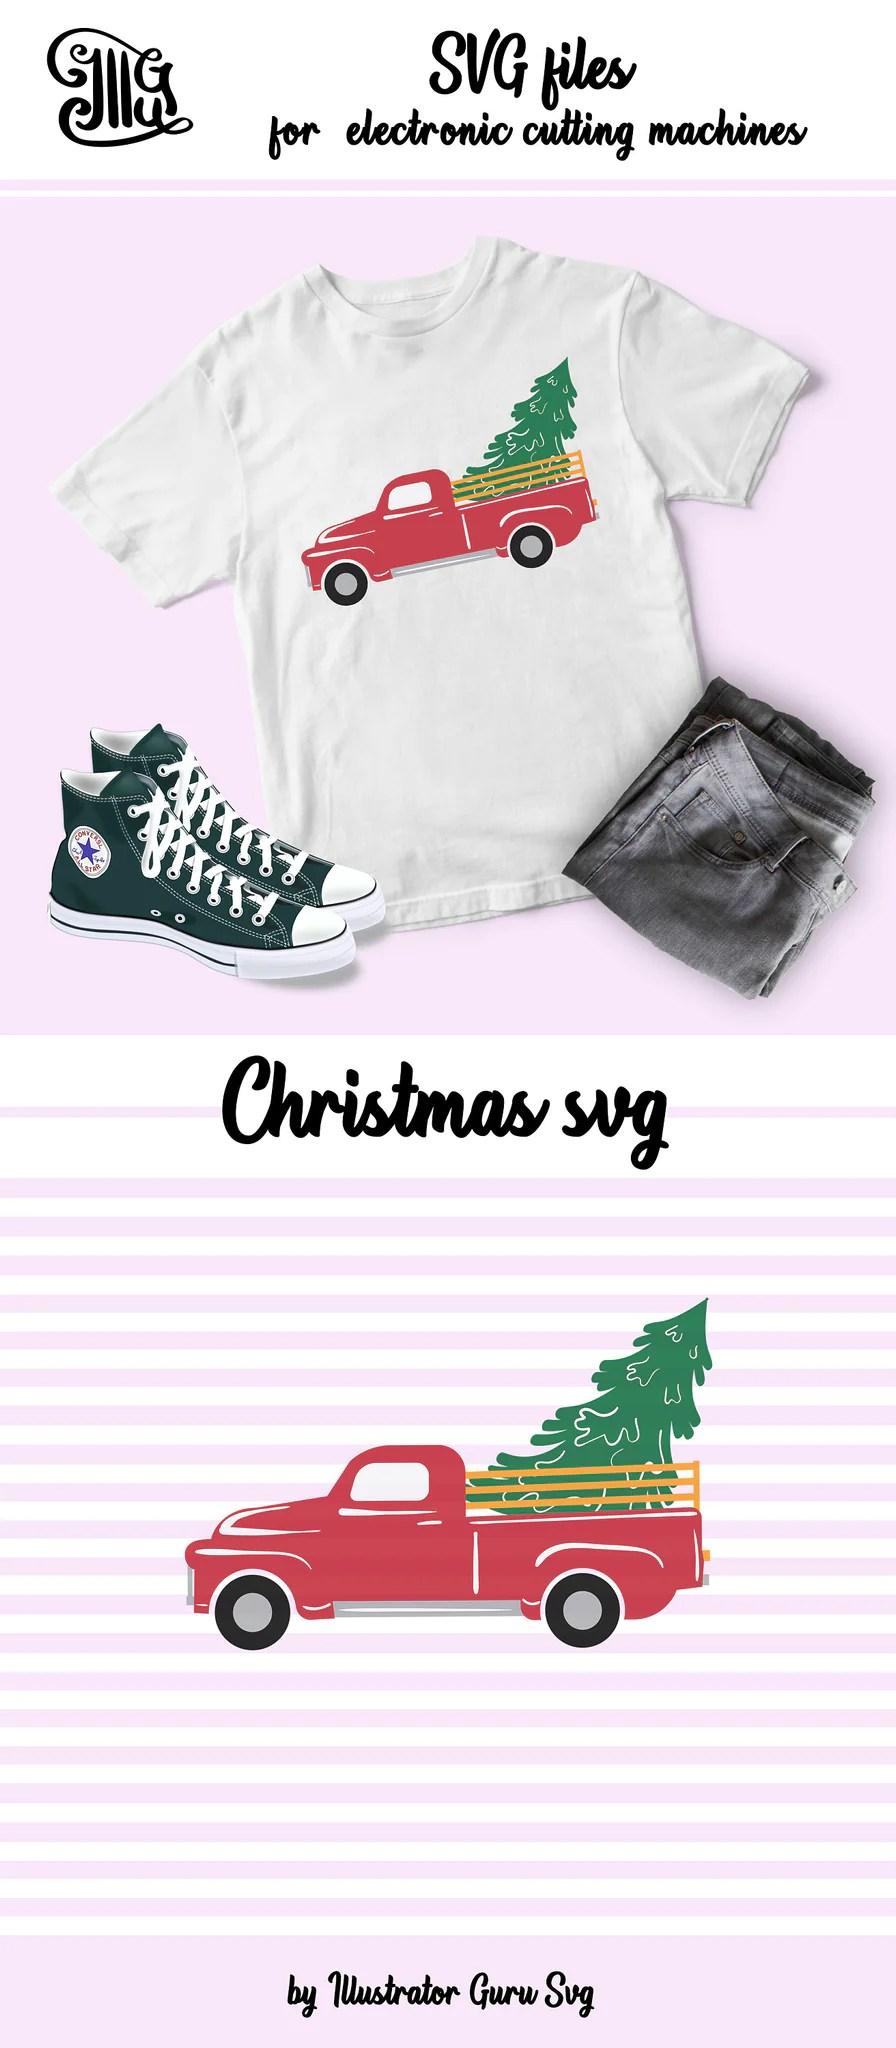 Christmas Truck Svg Free : christmas, truck, Vintage, Christmas, Truck, Shirt, Illustrator